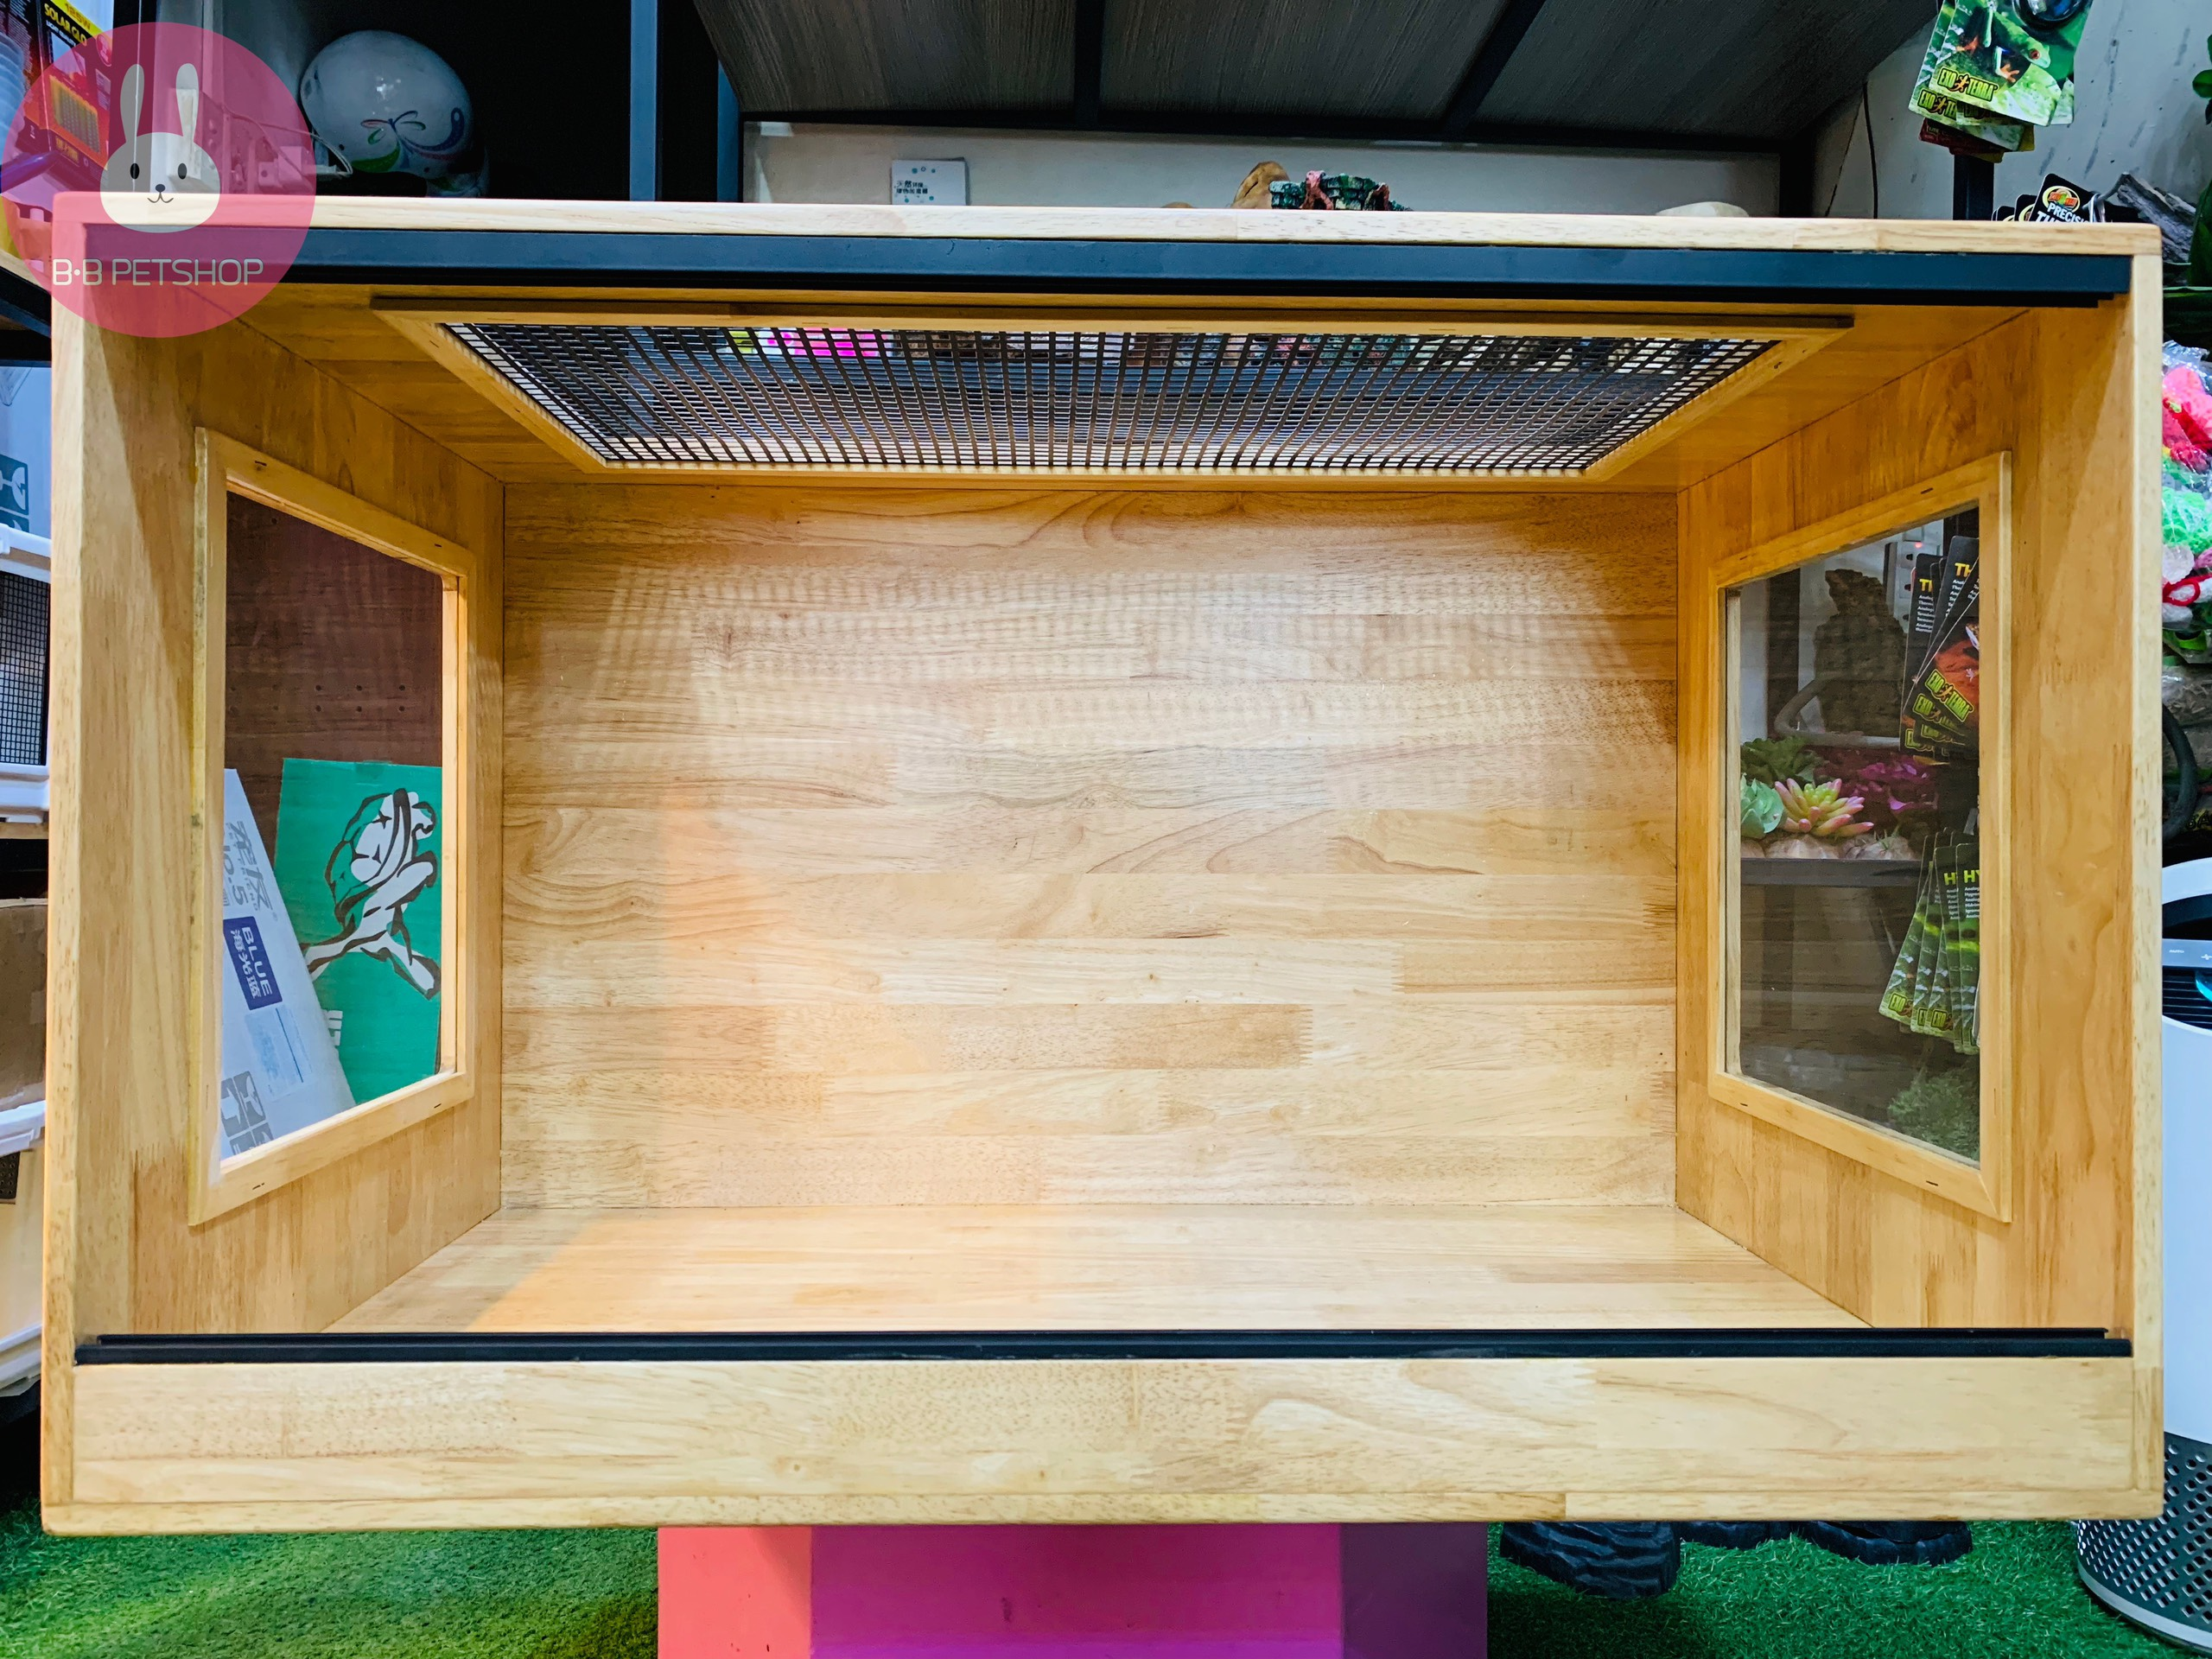 Chuồng gỗ (80x50x50)cm